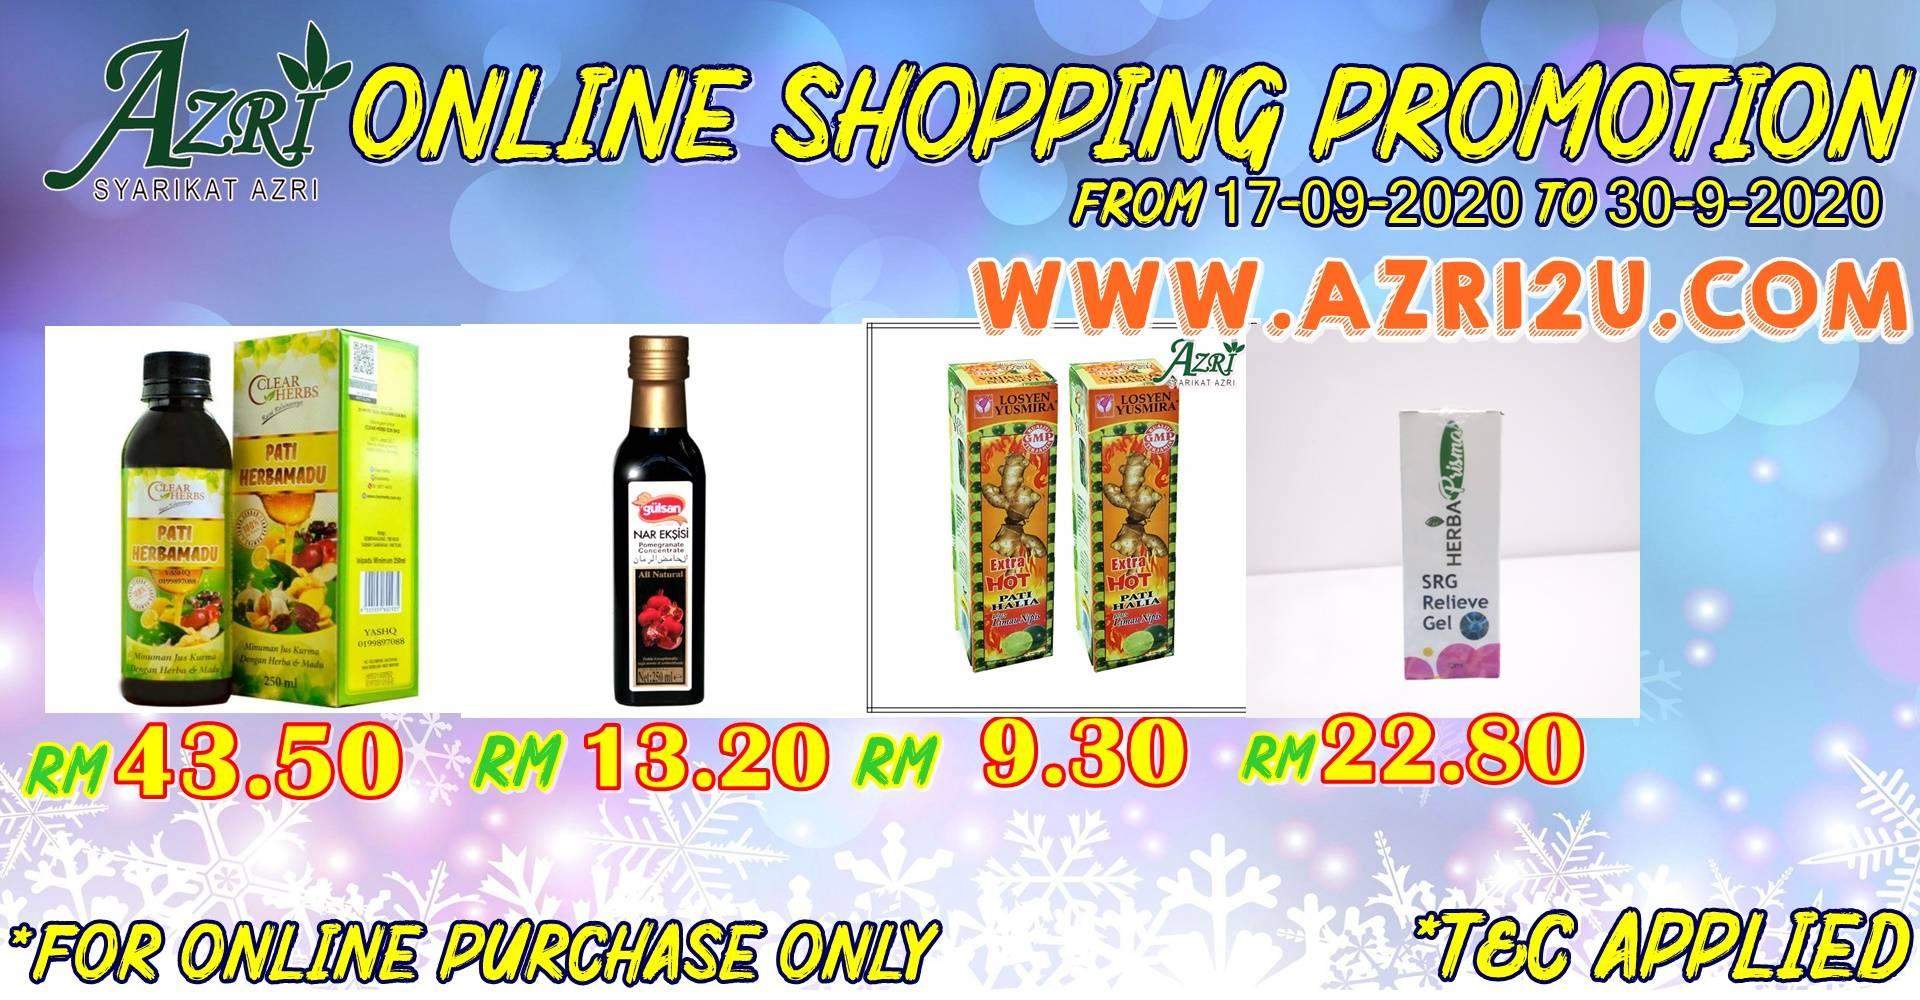 AZRI ONLINE SHOPPING